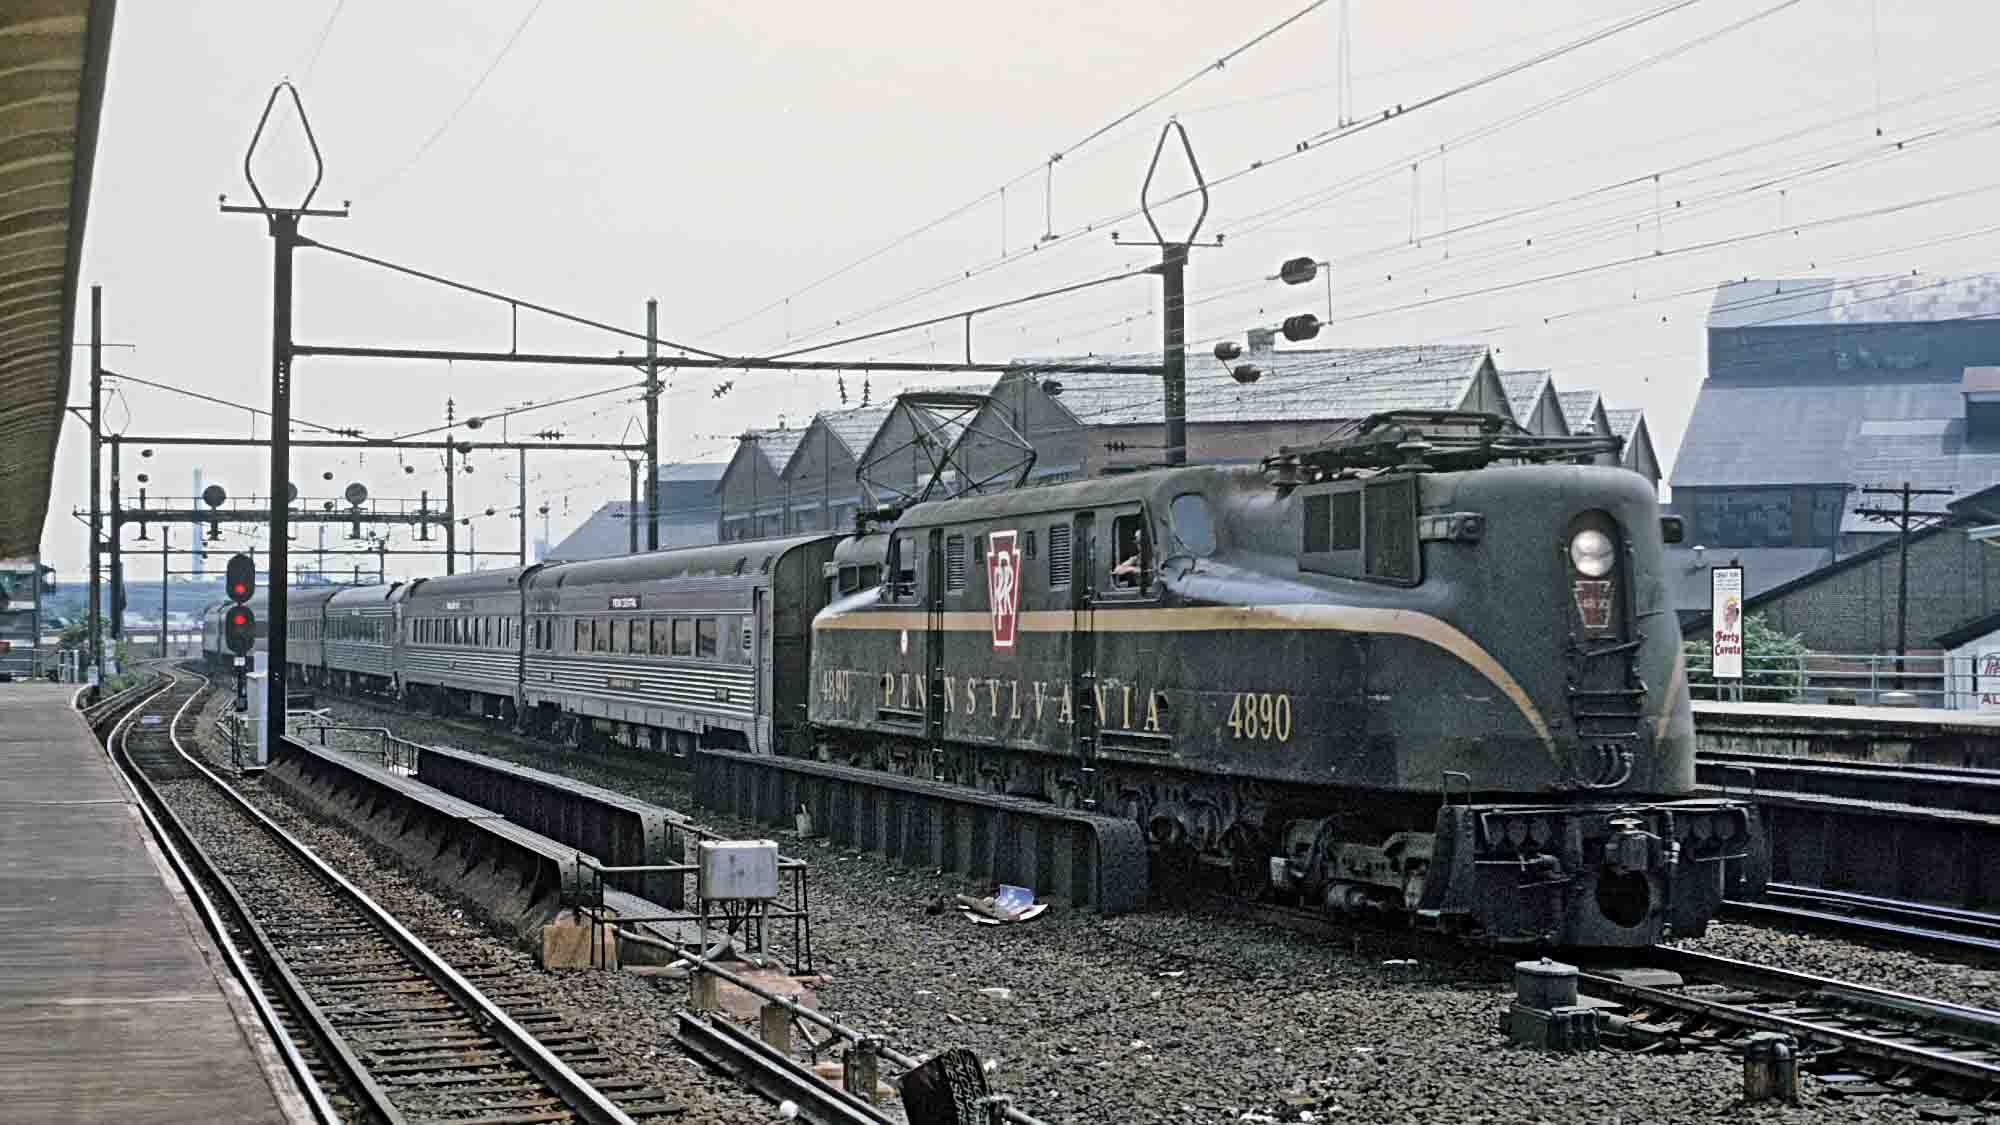 GG1-4890-Harrison-NJ-1969-Roger-Puta